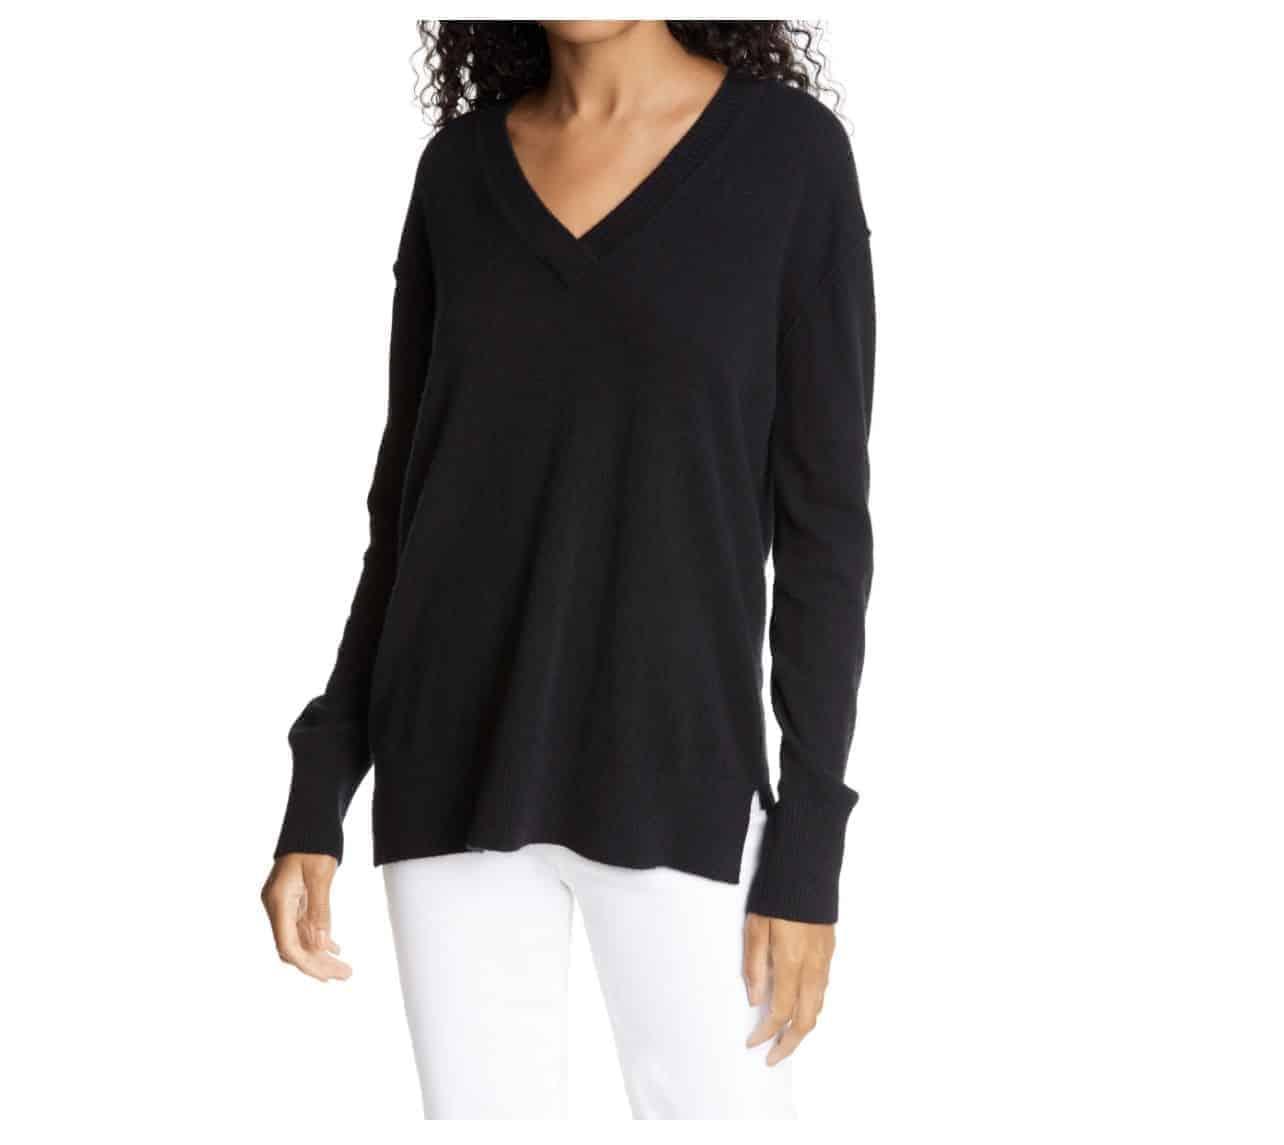 v-neck-cashmere-sweater